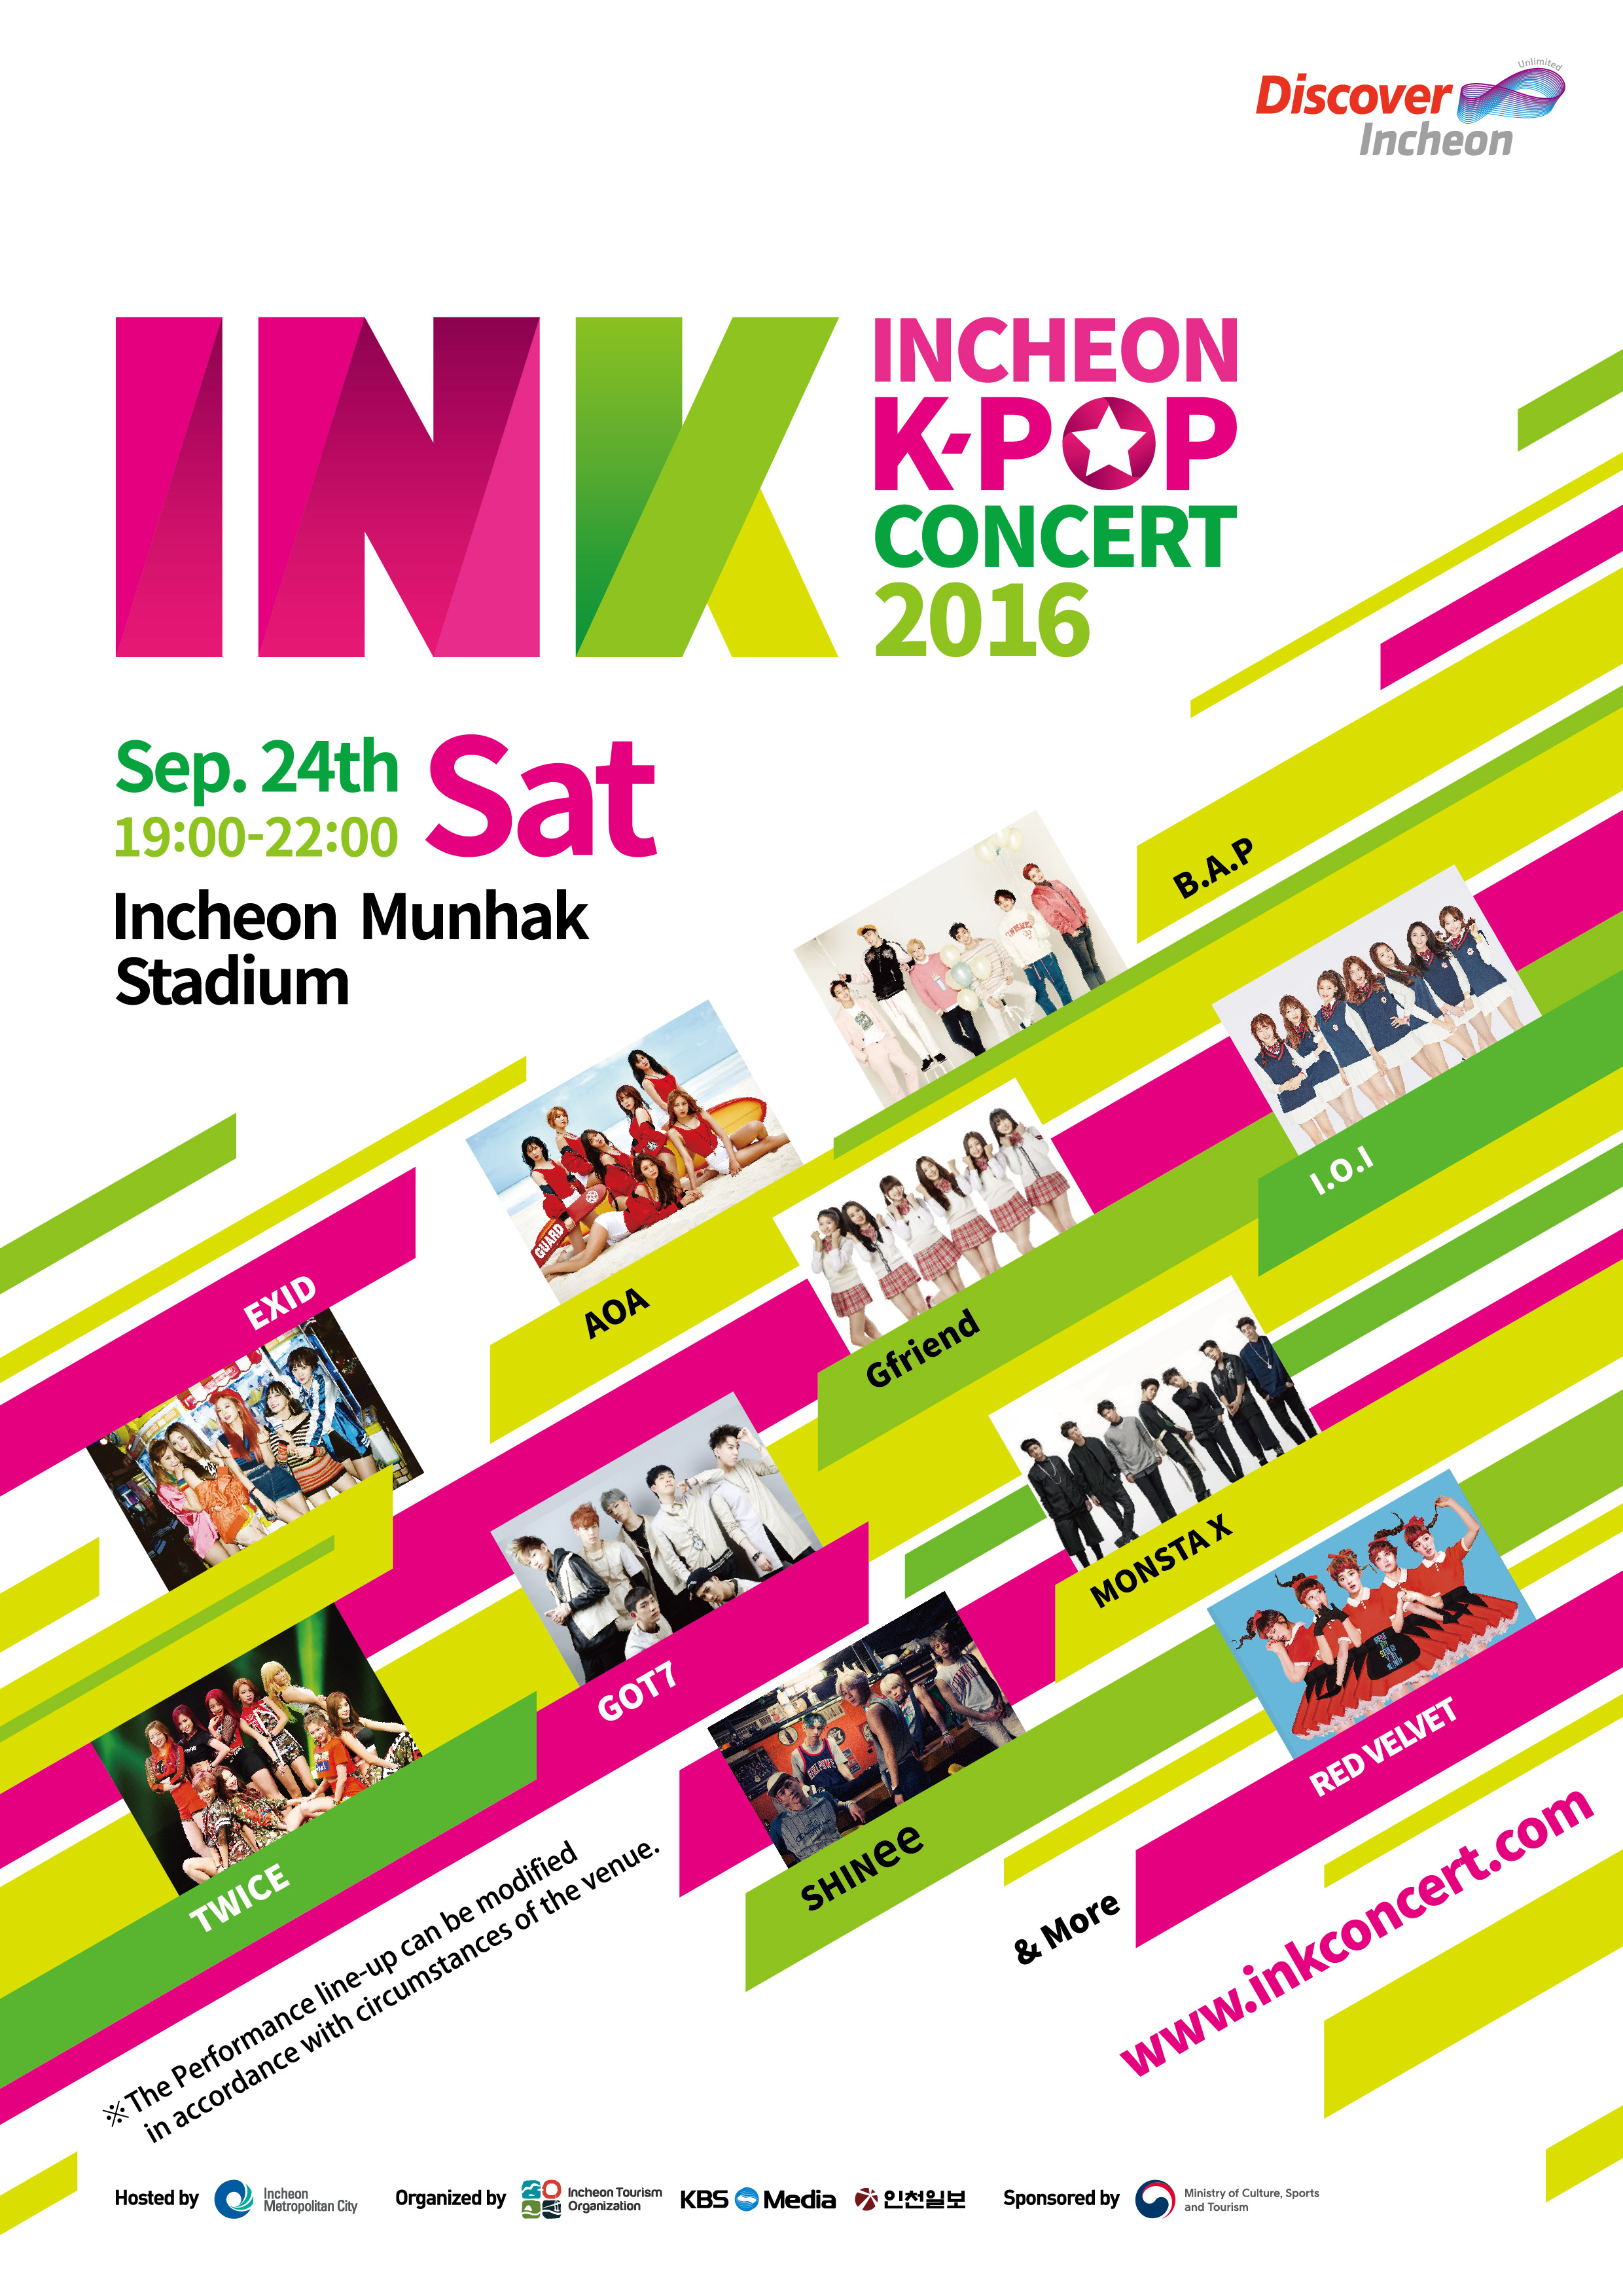 free* Incheon K-POP Concert on 9/24   Official Korea Tourism